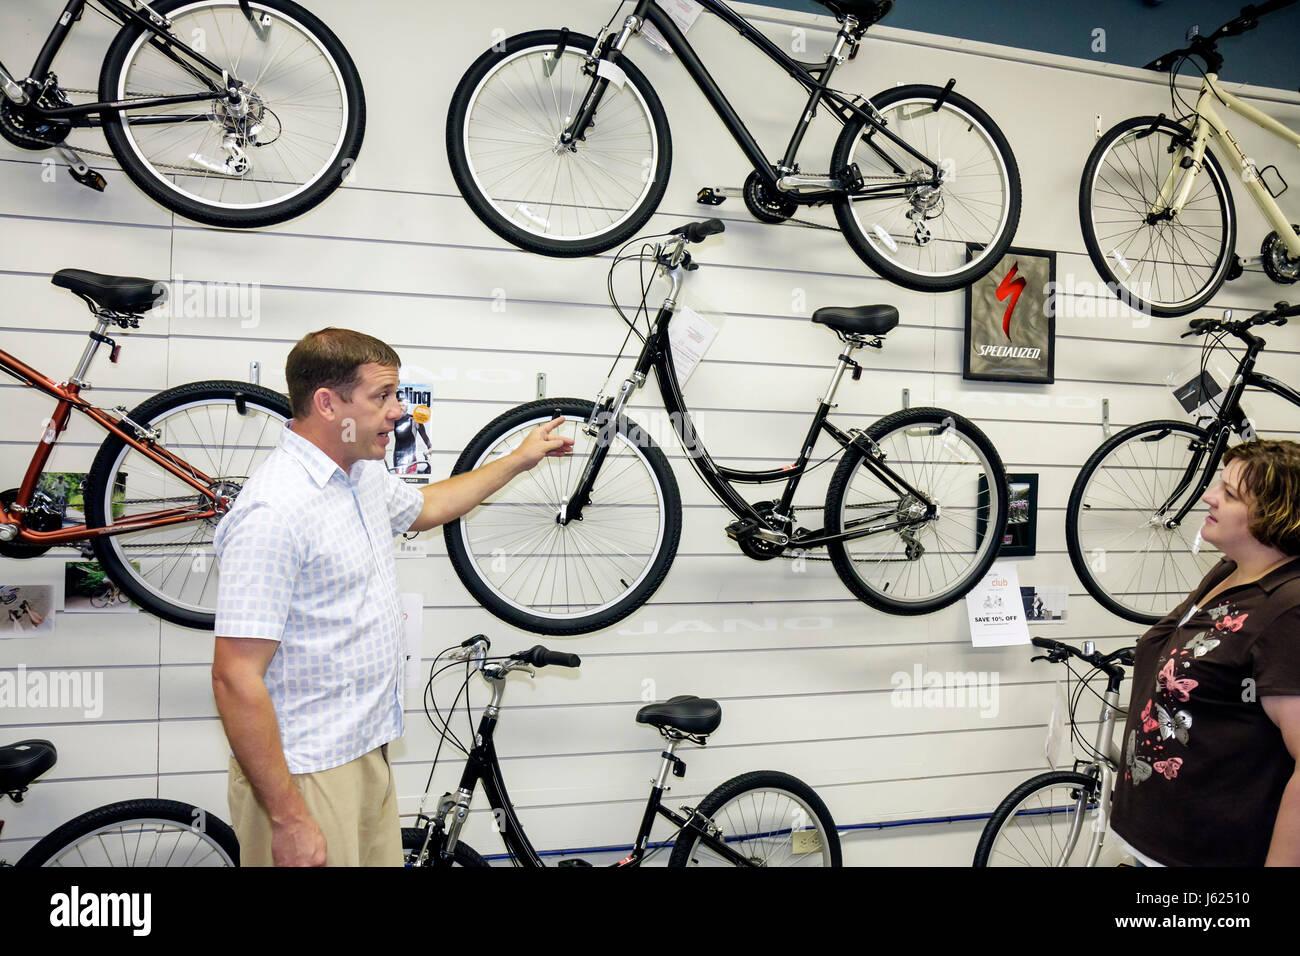 Indiana Valparaiso Jano Bicycles man salesman shop business bike sport exercise equipment sell choices wheel spoke - Stock Image